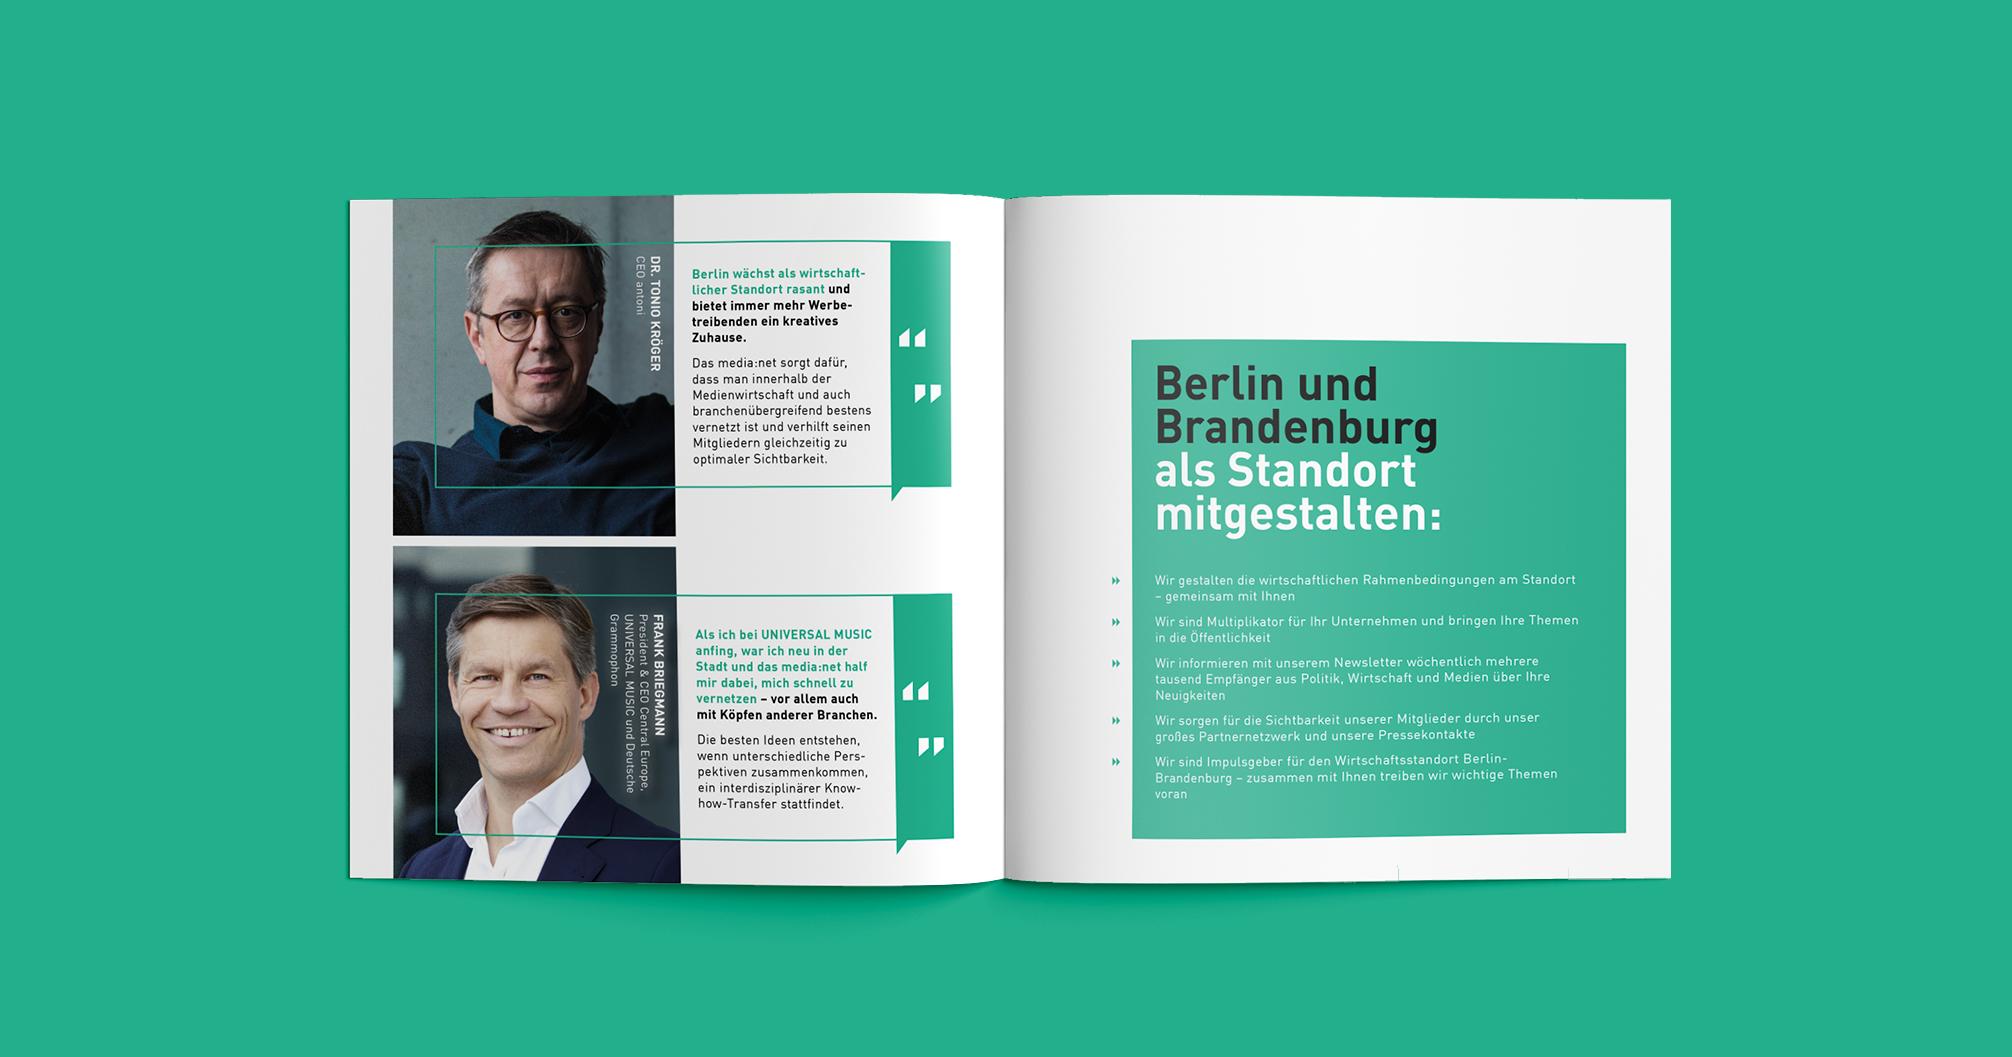 Media net berlinbrandenburg Image Booklet | Redesign Corporate Identity - Berlin